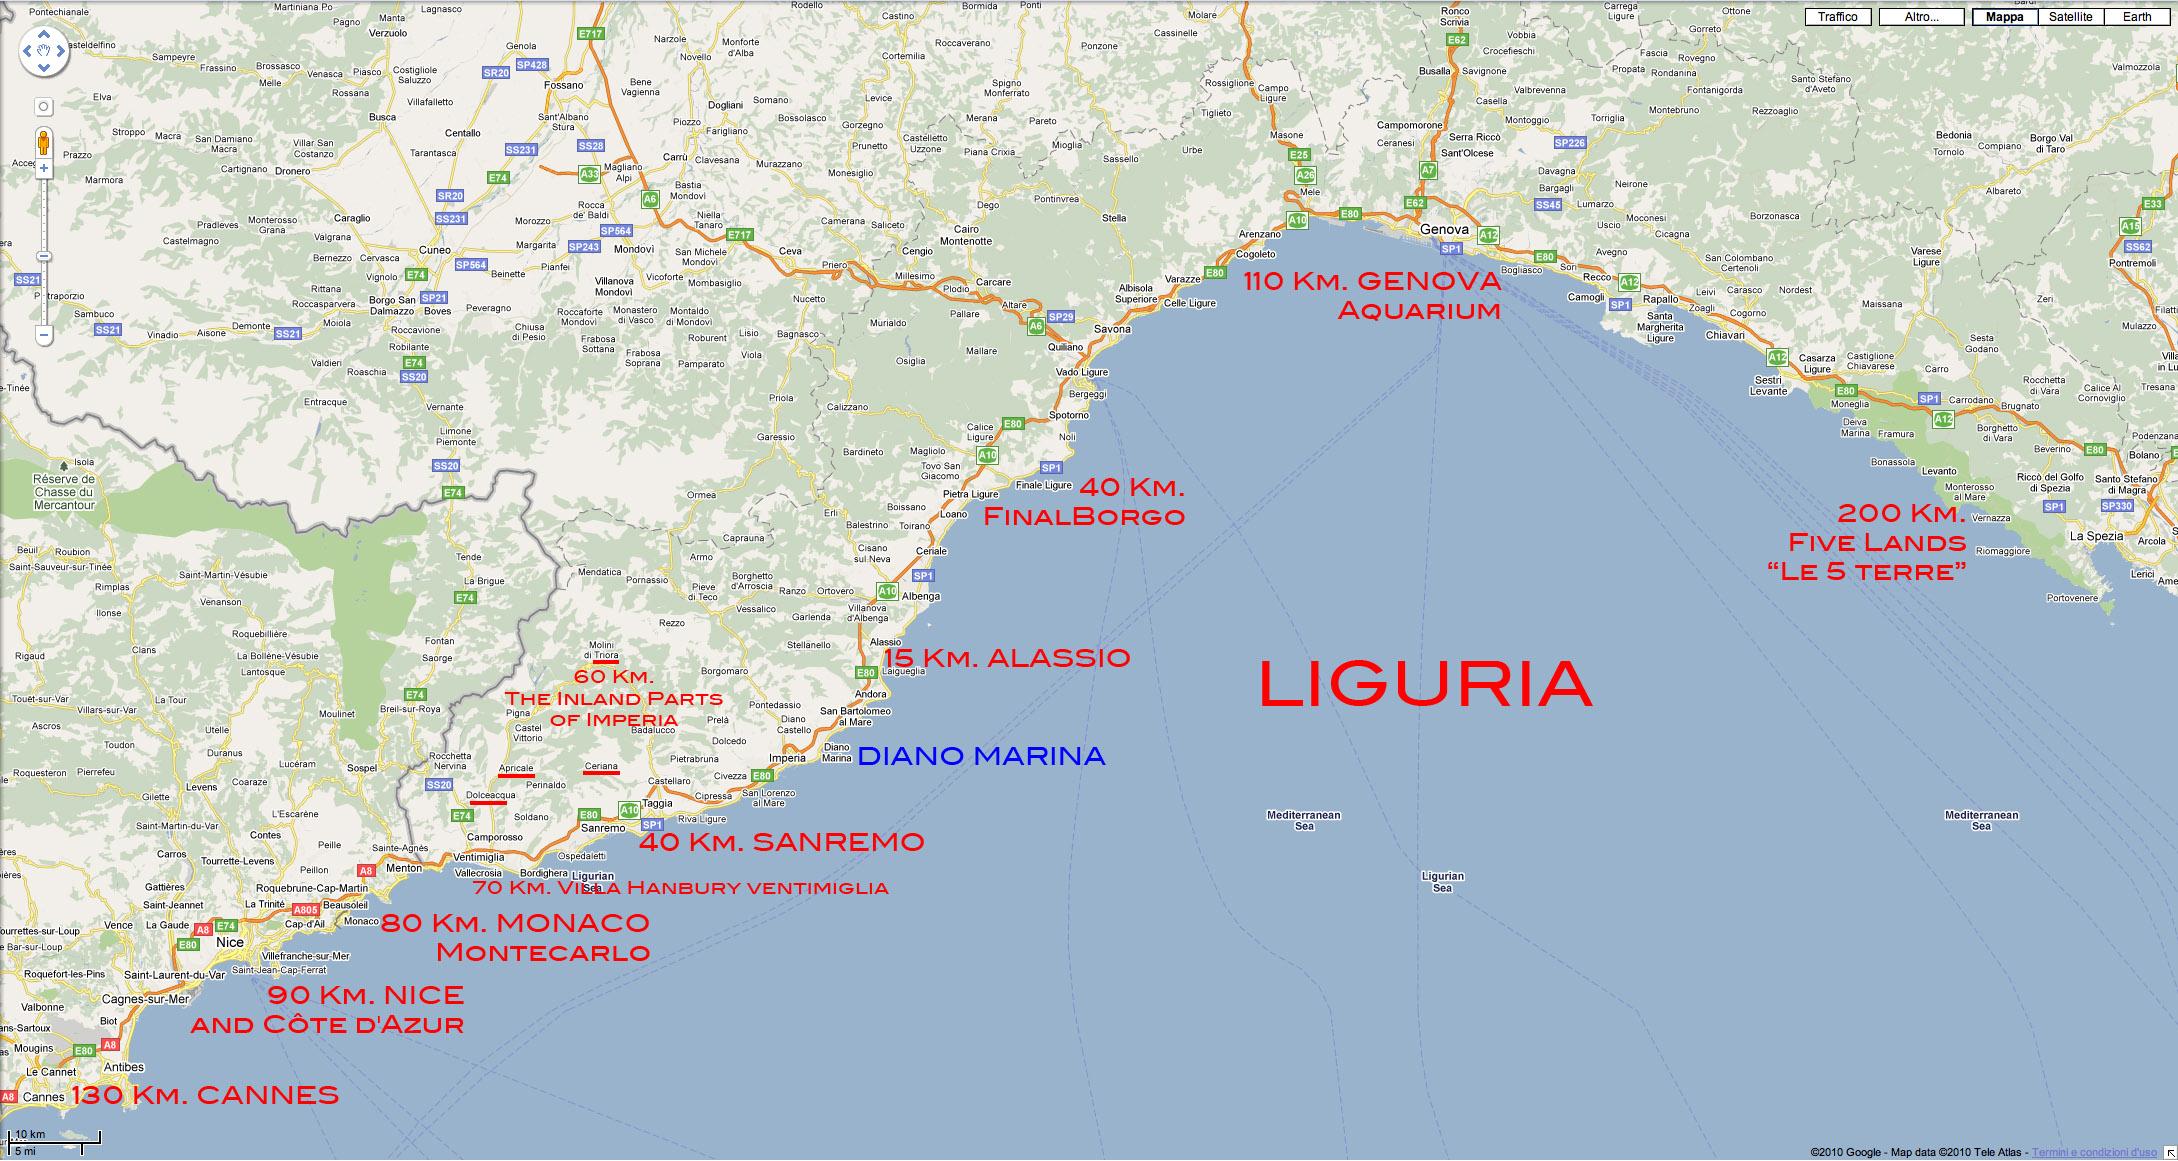 liguria it: